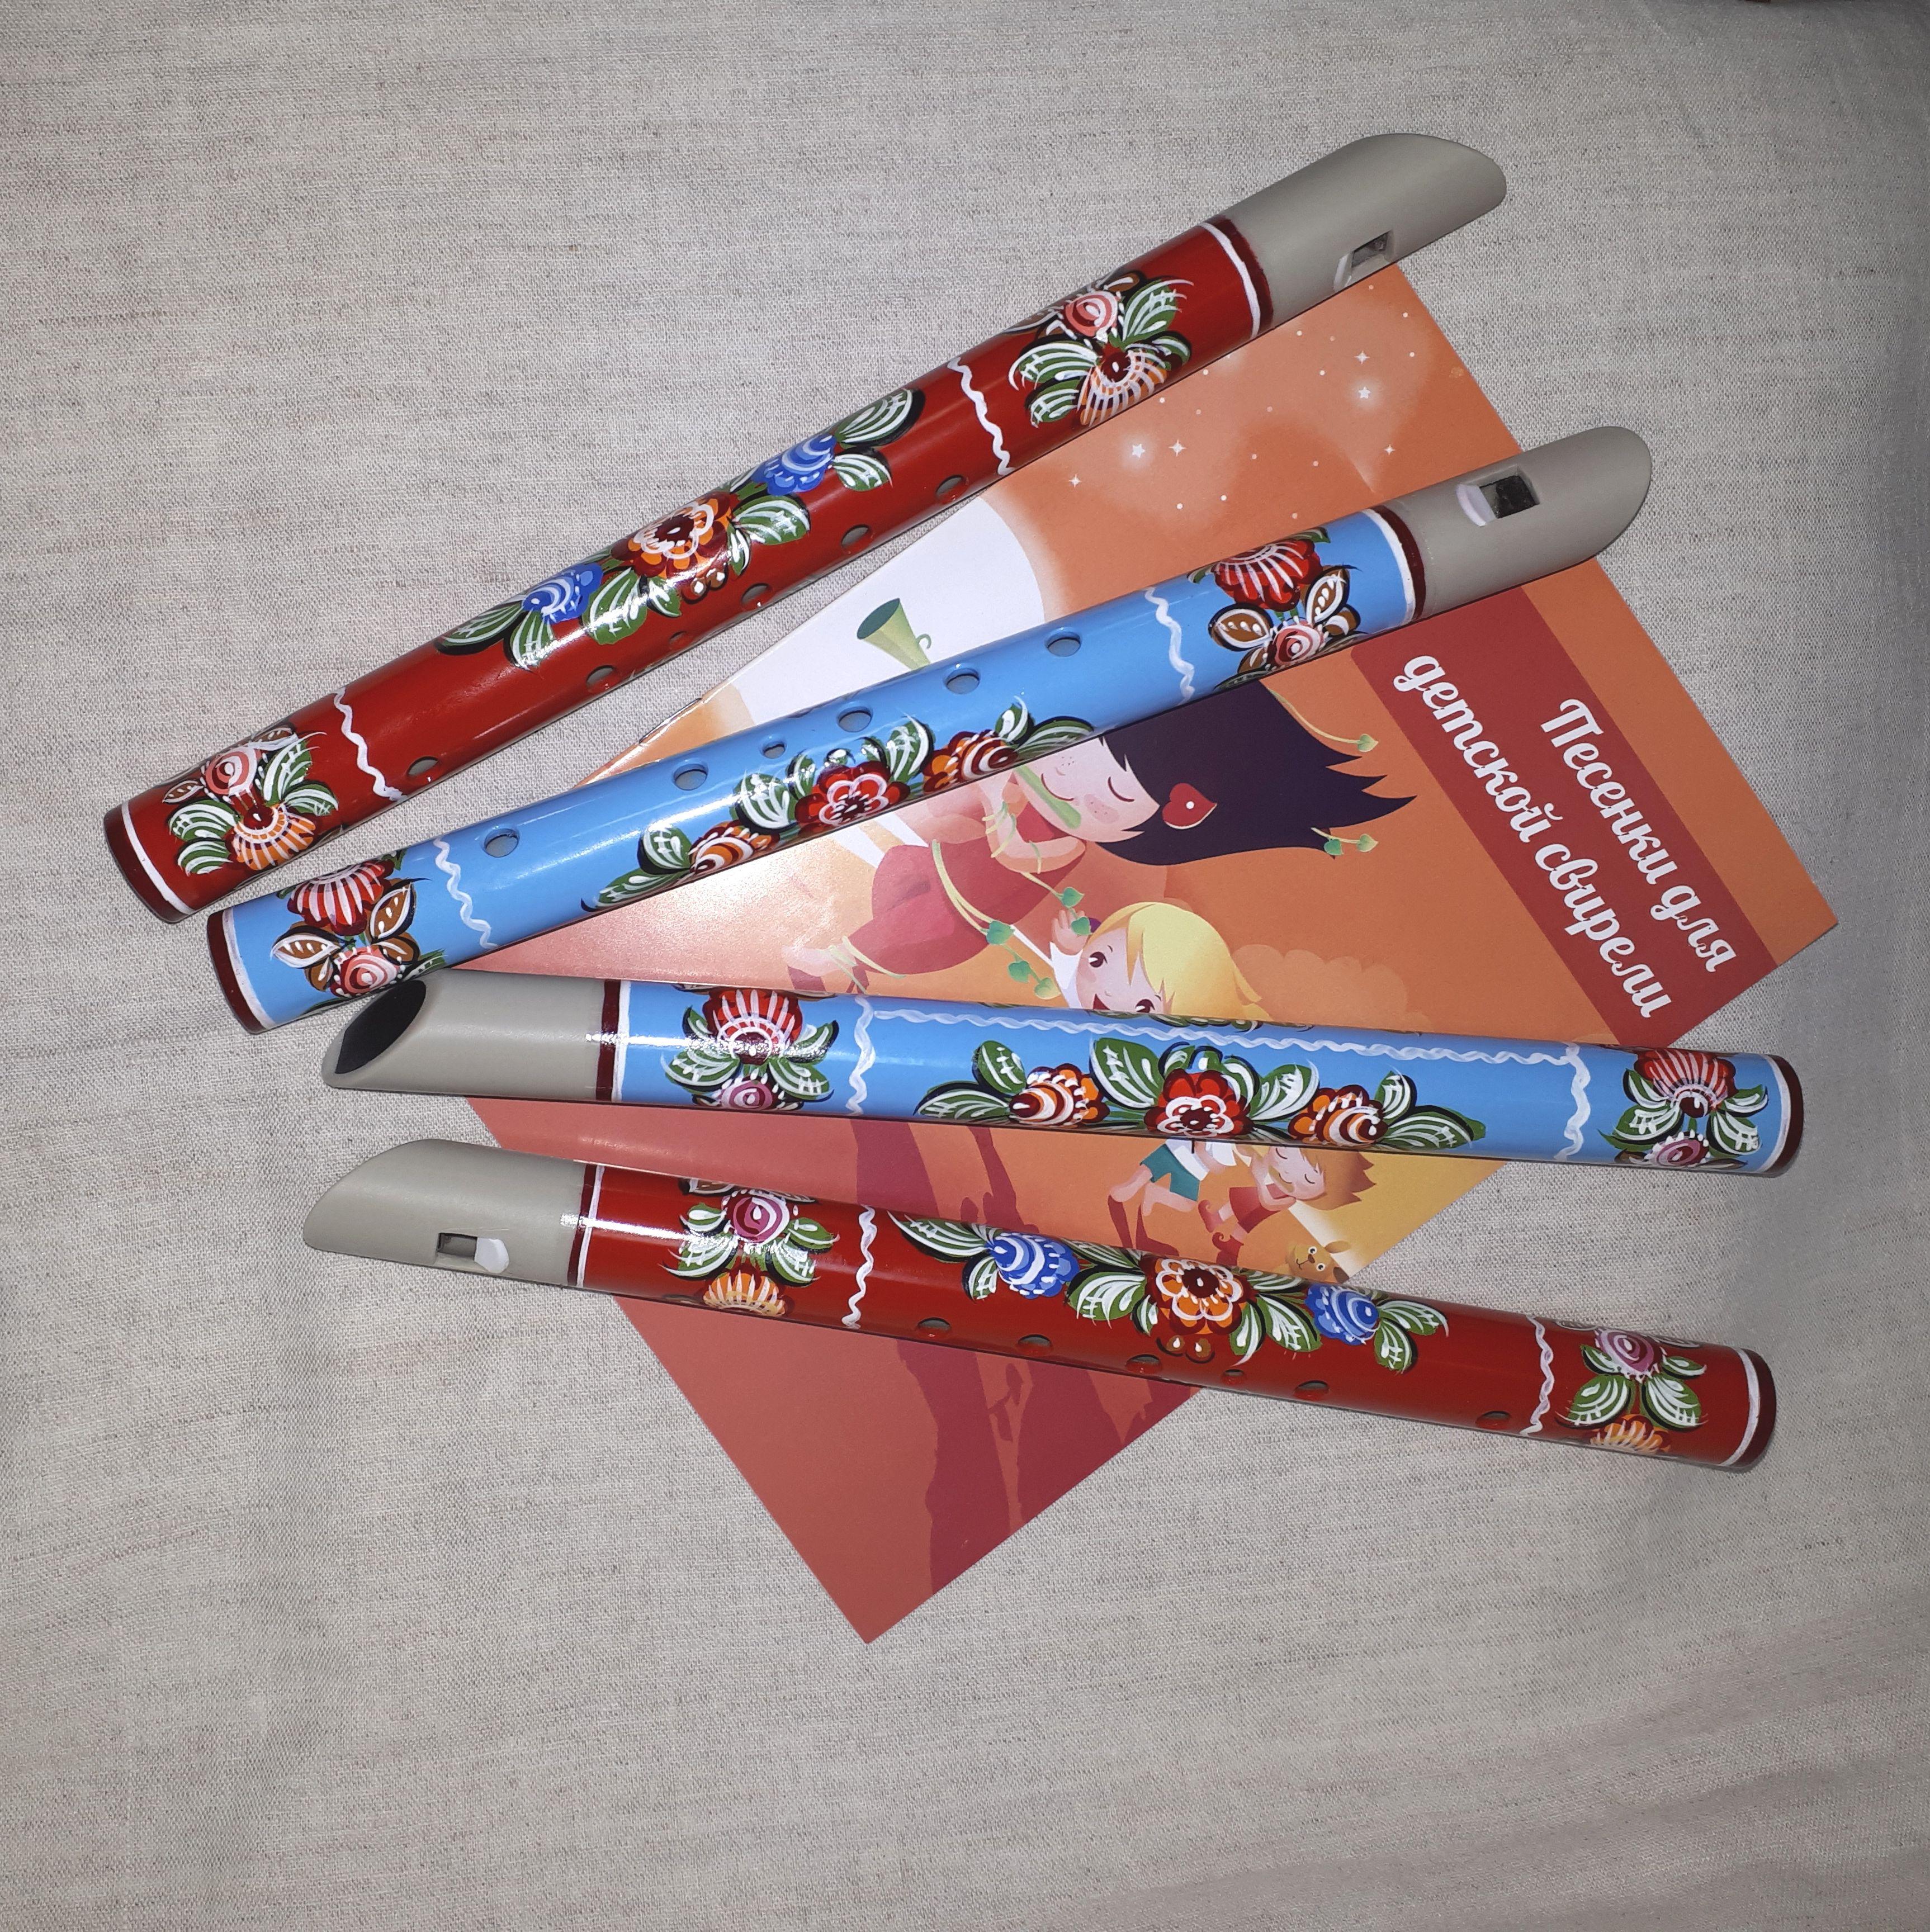 Serebrov's workshop / Marvelous pipe